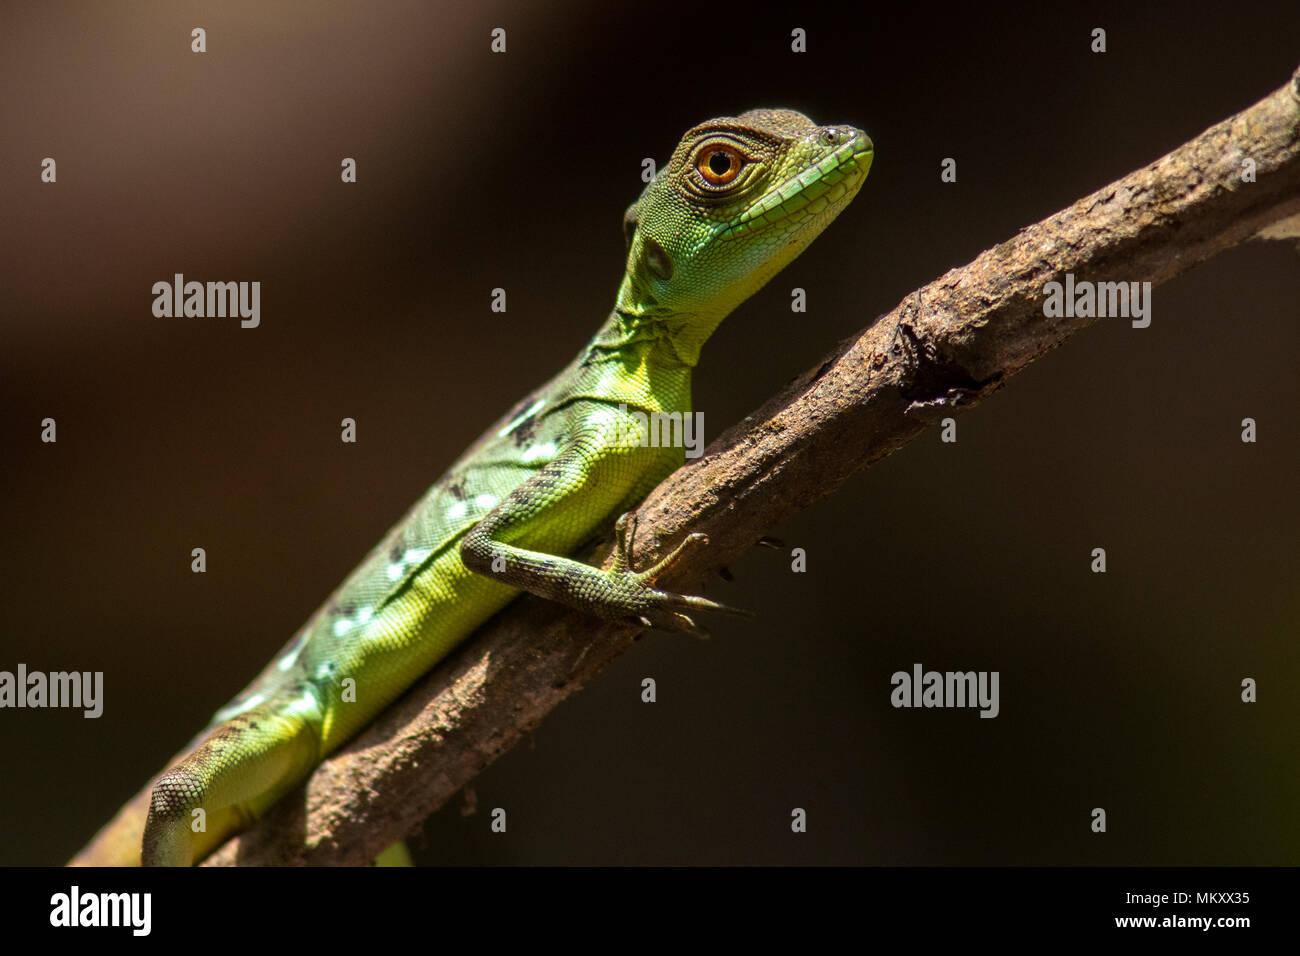 Juvenile Plumed basilisk (Basiliscus plumifrons) - La Laguna del Lagarto Lodge, Boca Tapada, Costa Rica Stock Photo